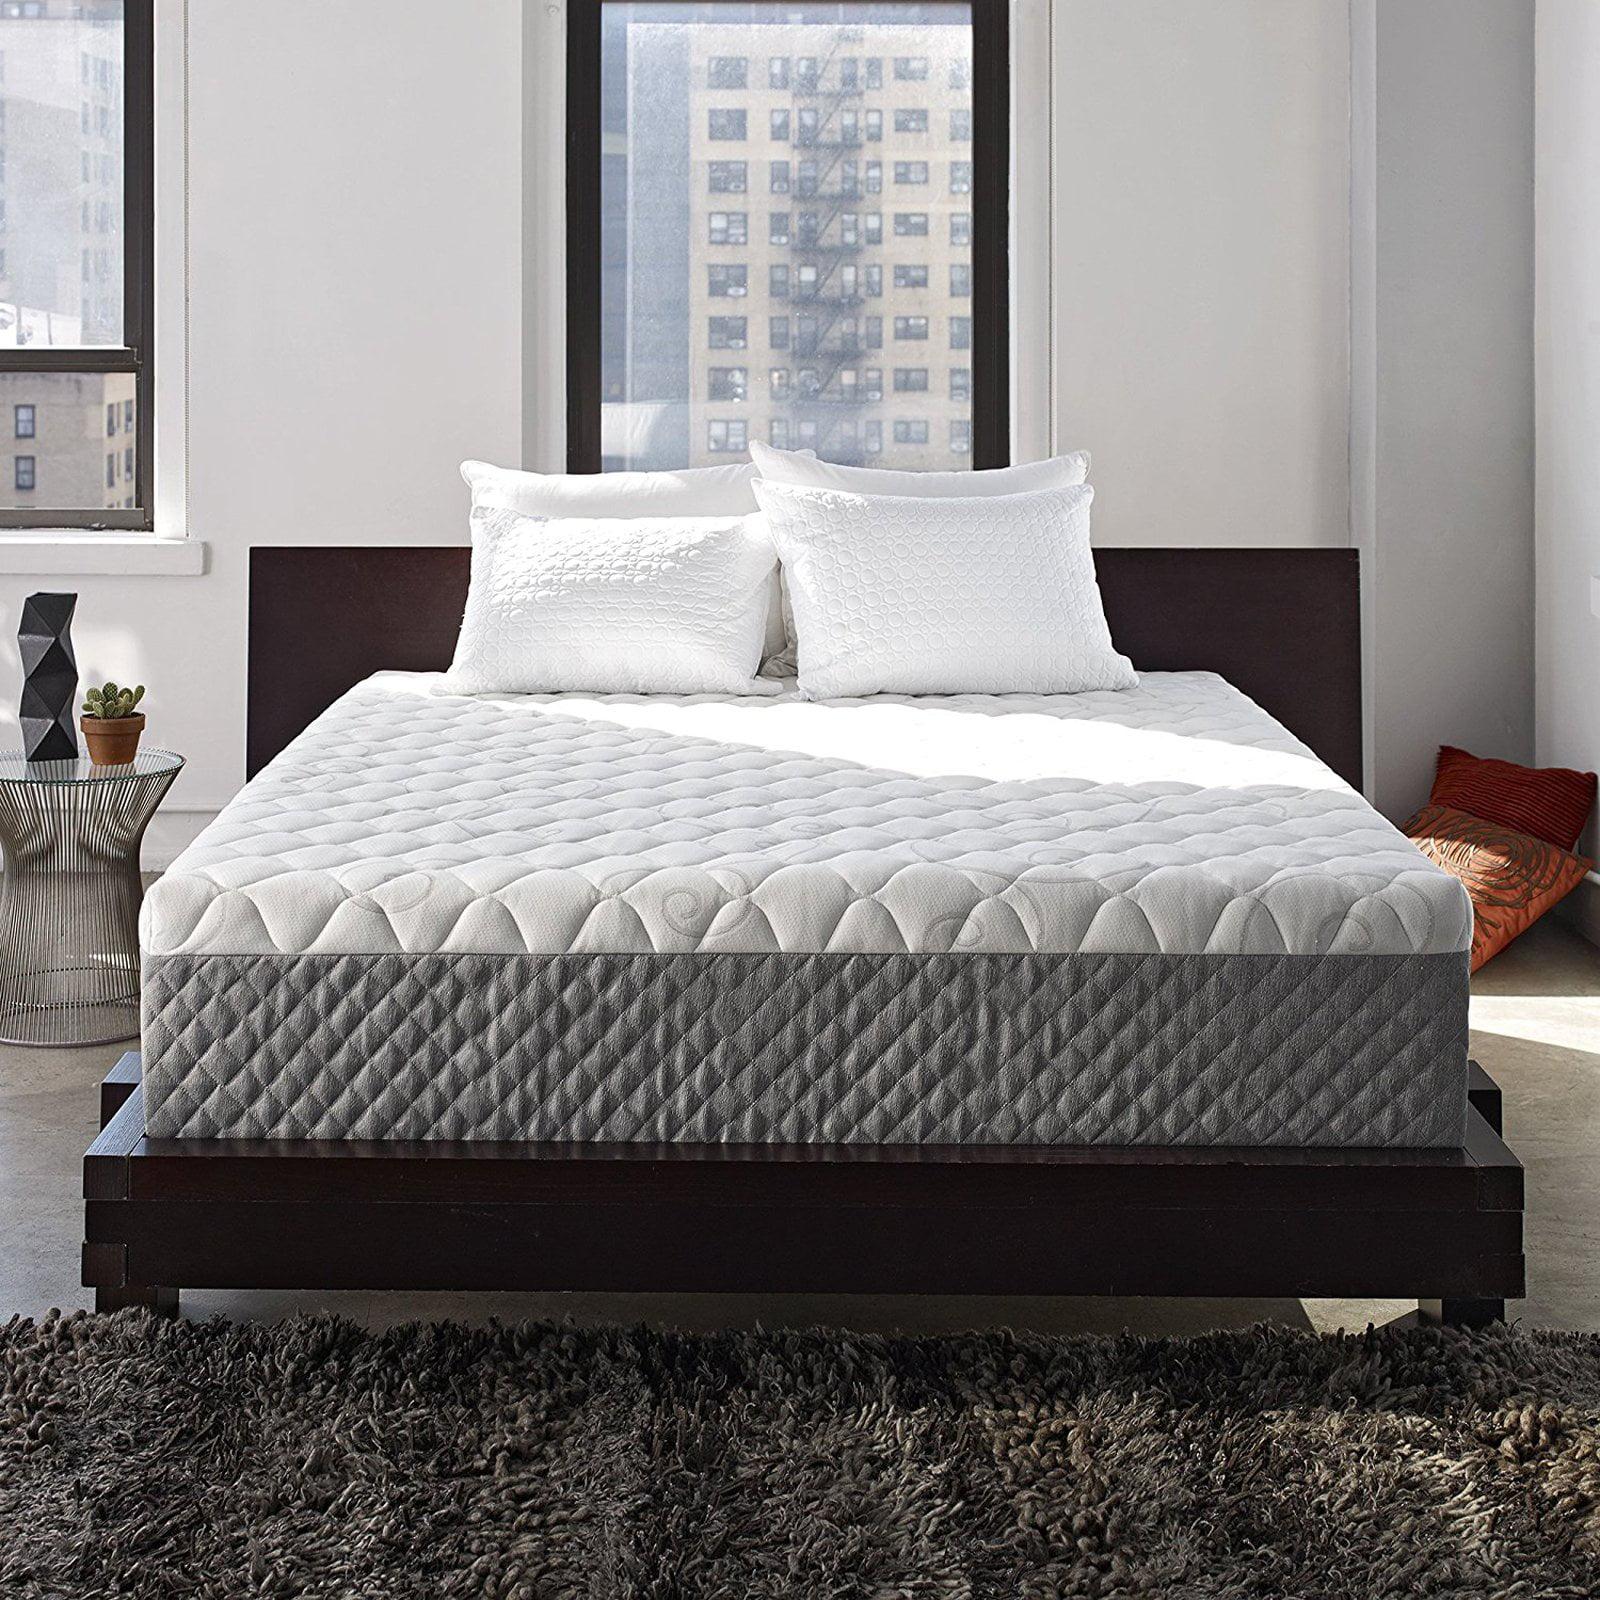 Sleep Innovations Alden 14 in. Memory Foam Mattress